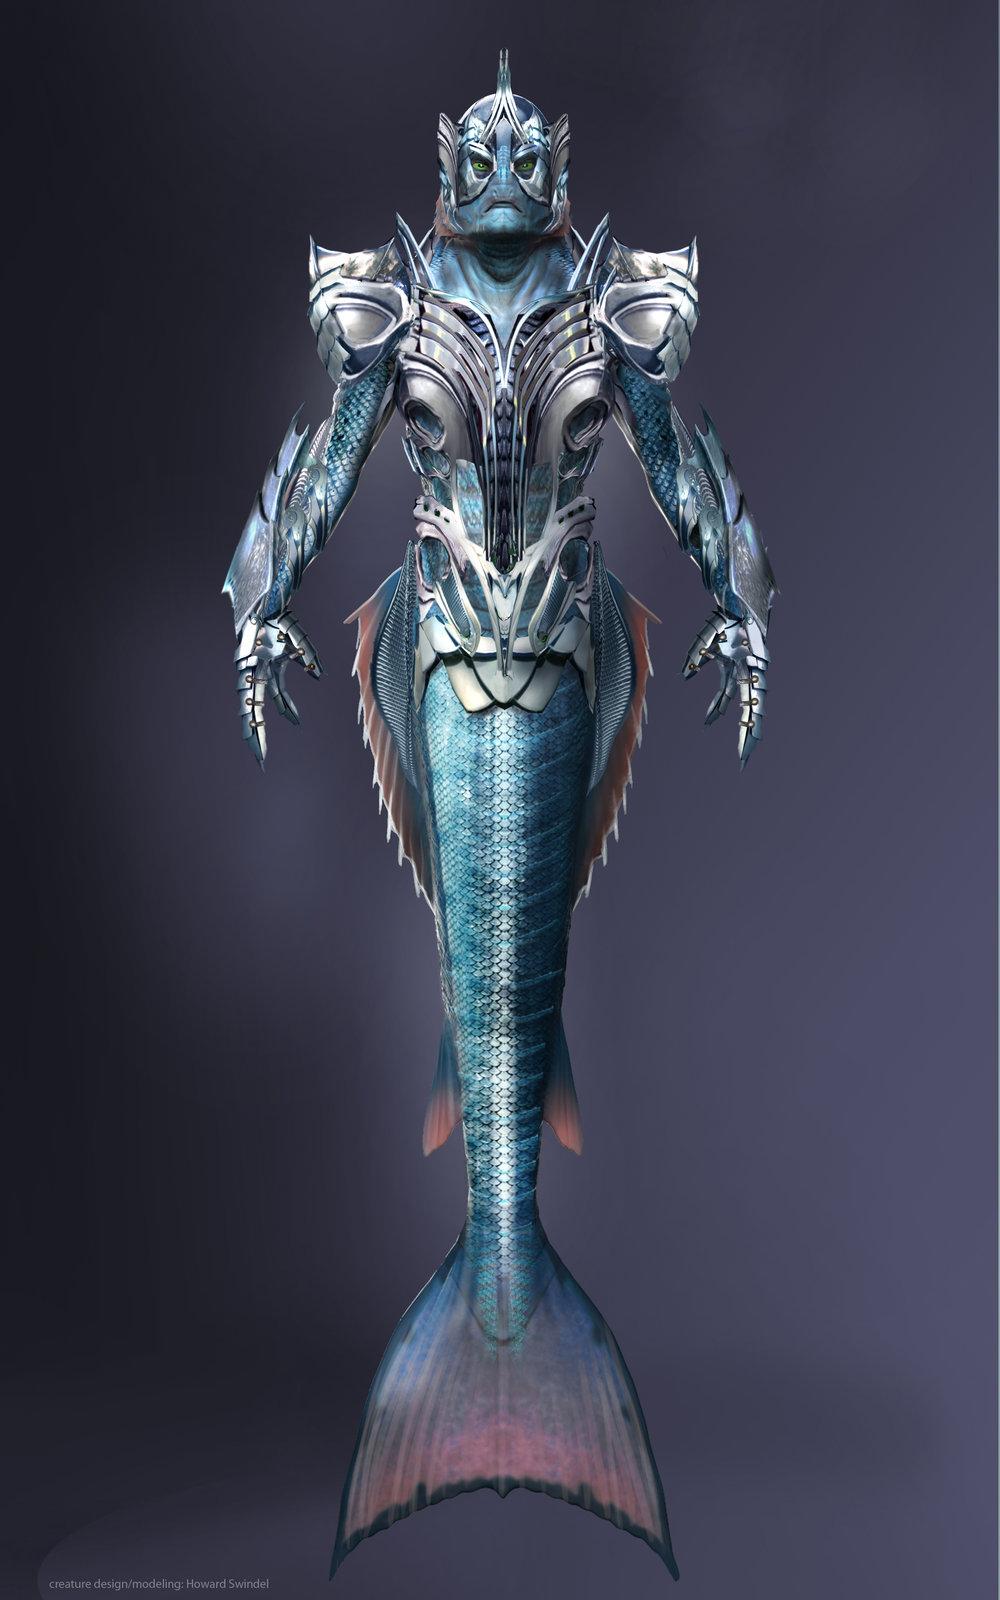 fisherman_soldier_silver.jpg